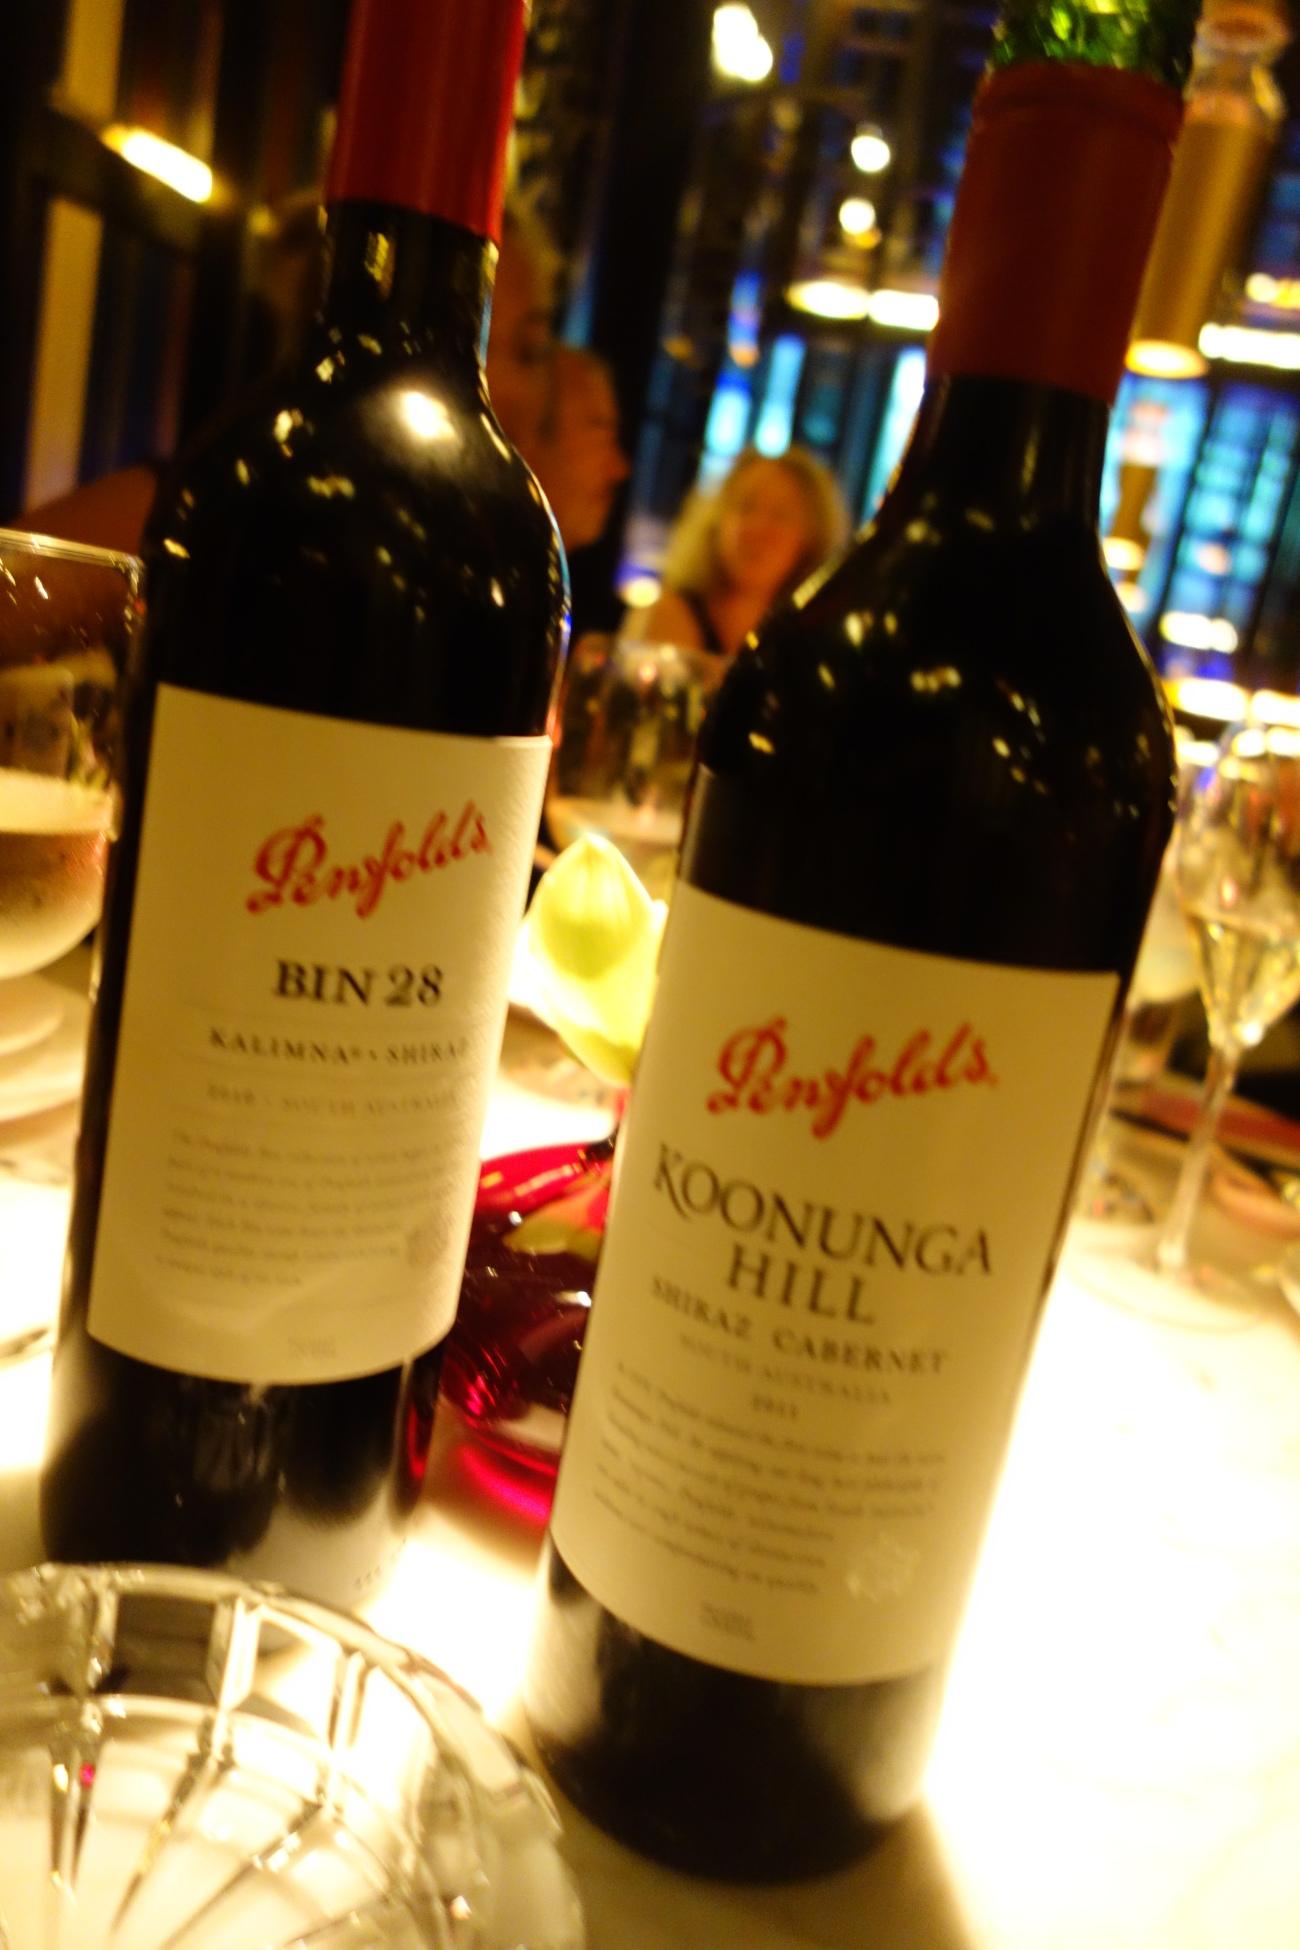 Penfolds wine